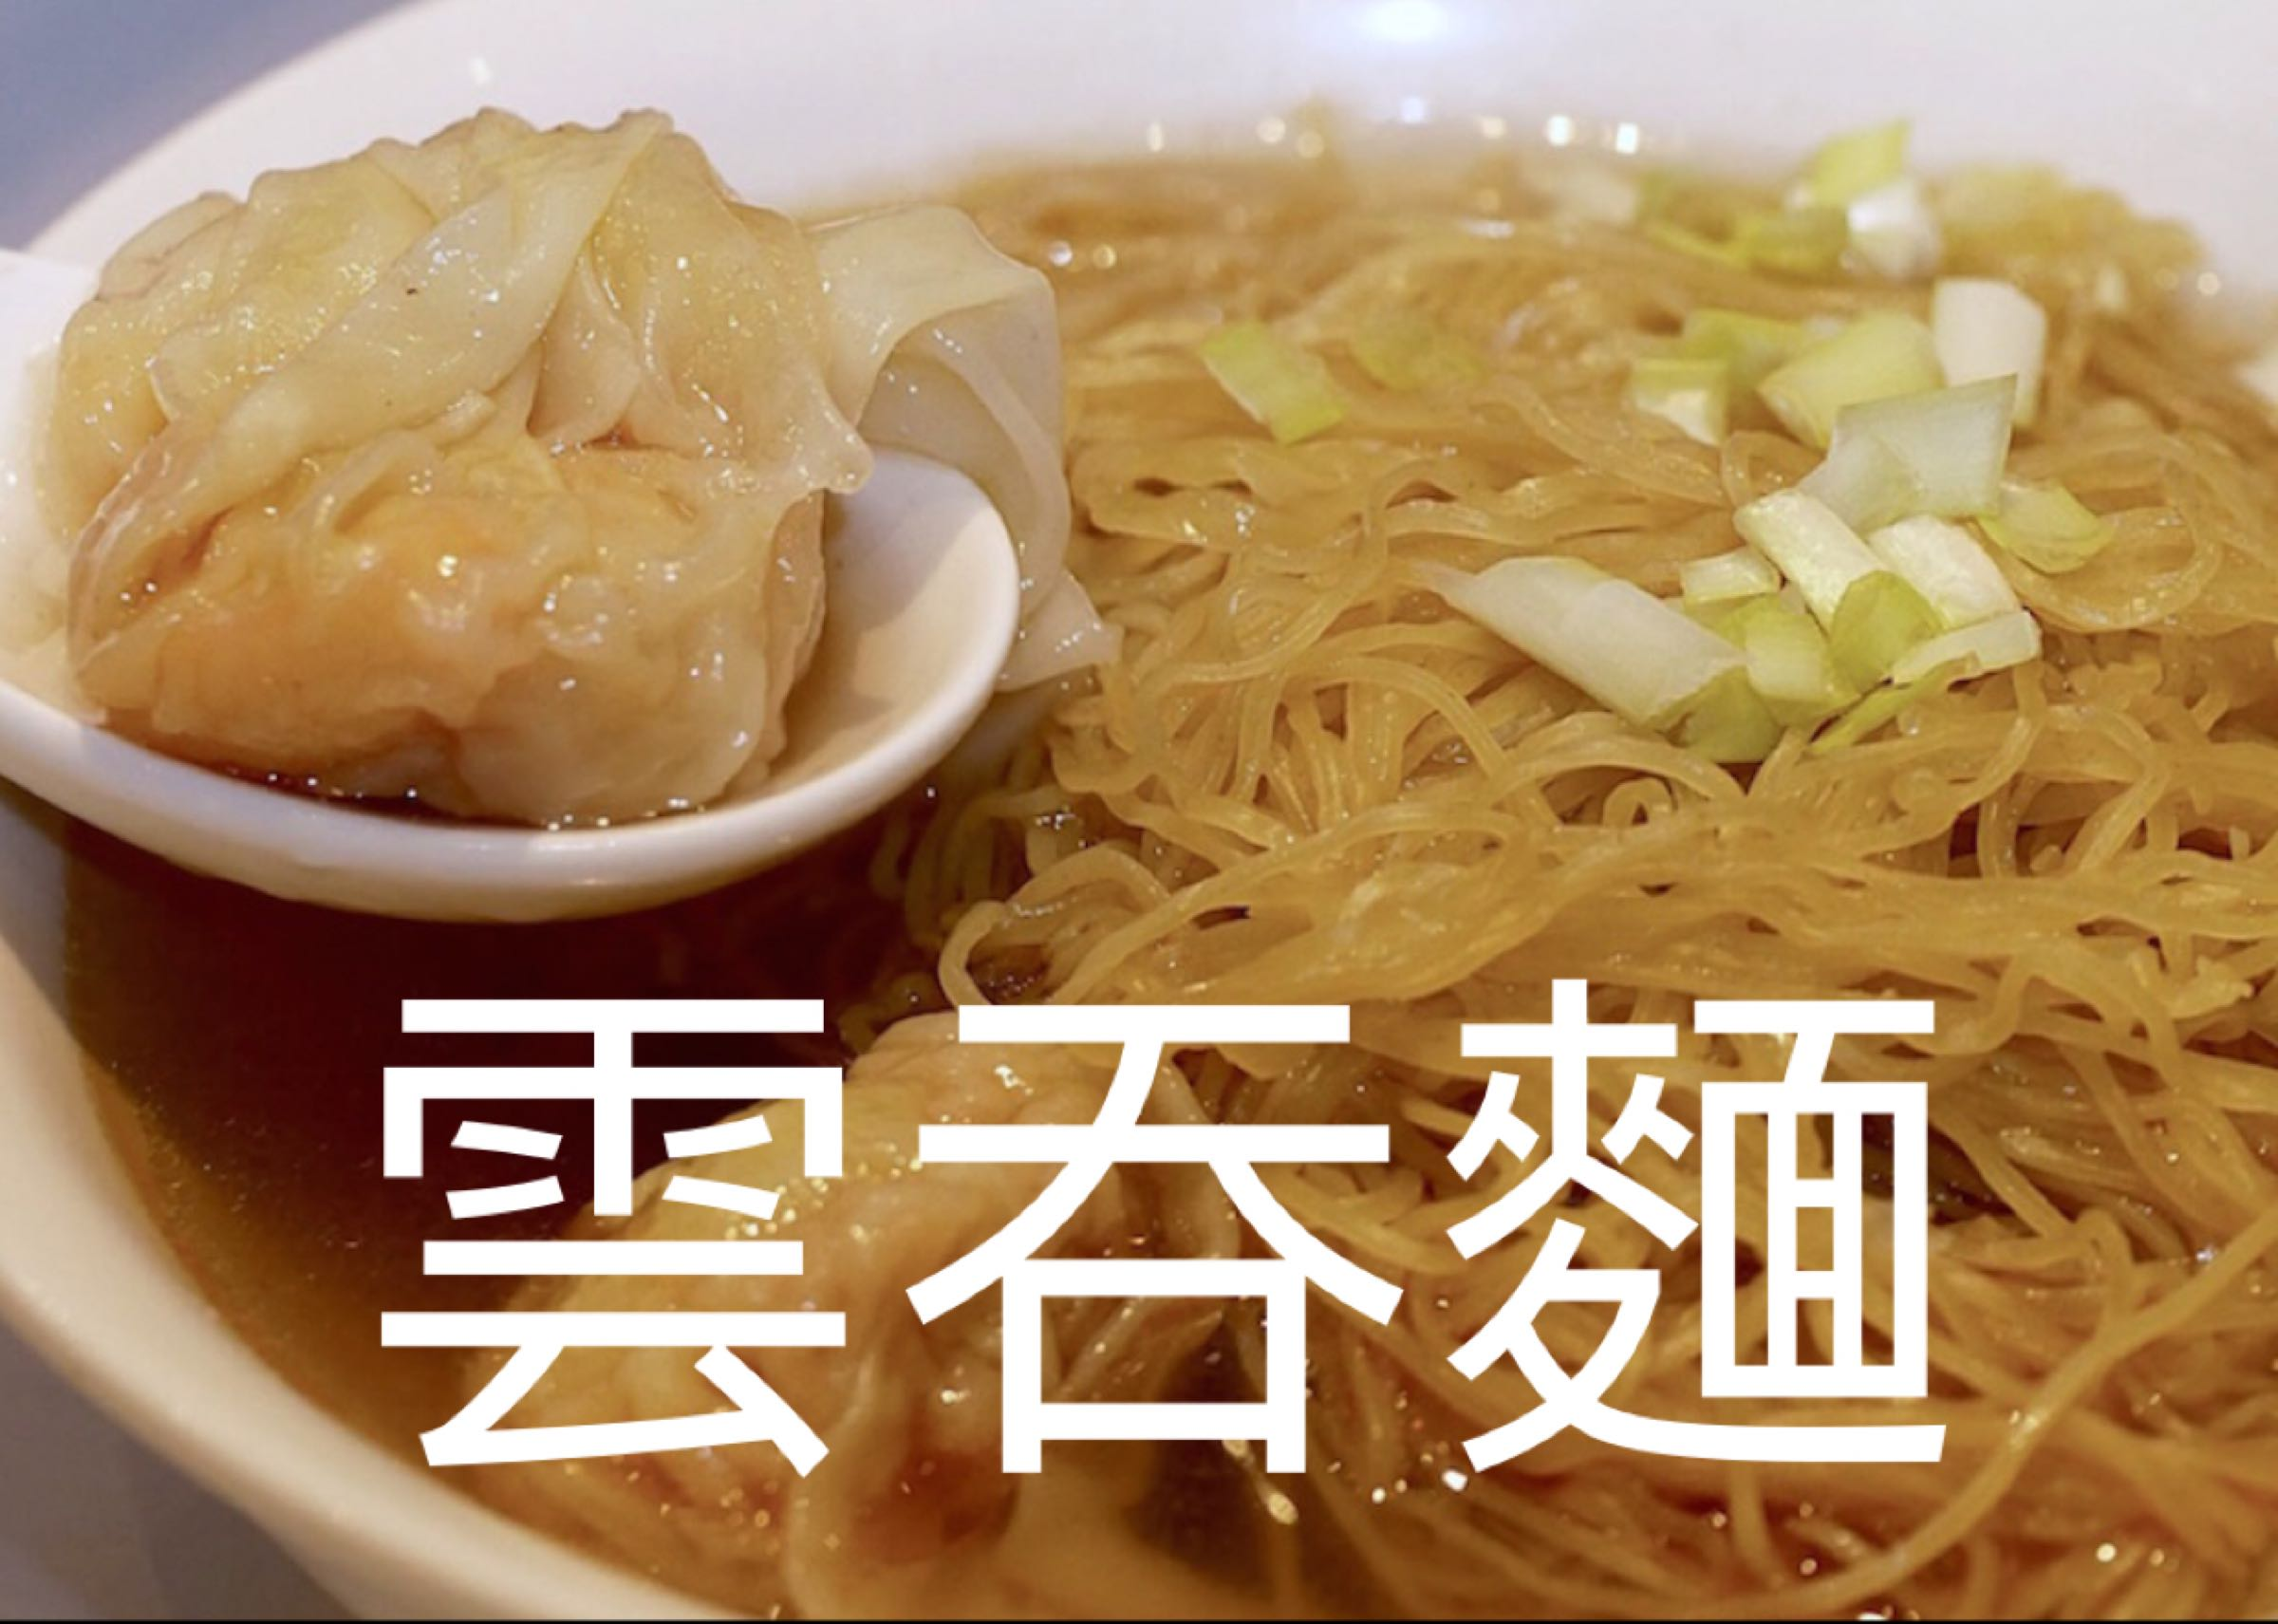 雲吞麵 Wonton Soup Noodle